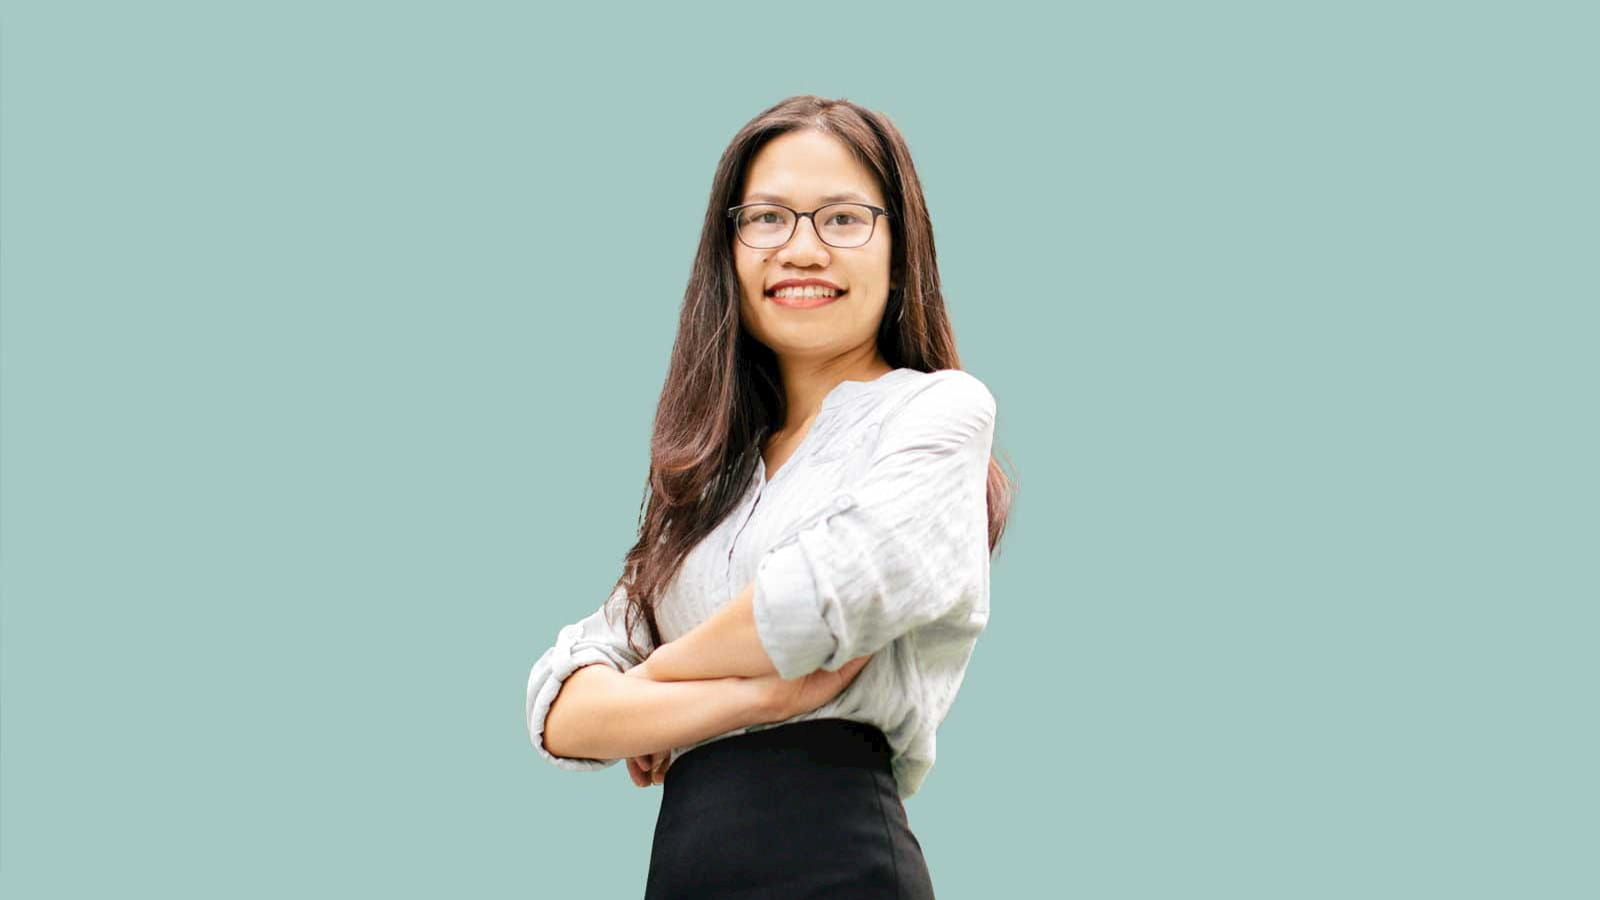 Mai Thi Hong Nhung, the first ACA qualified accountant in Vietnam